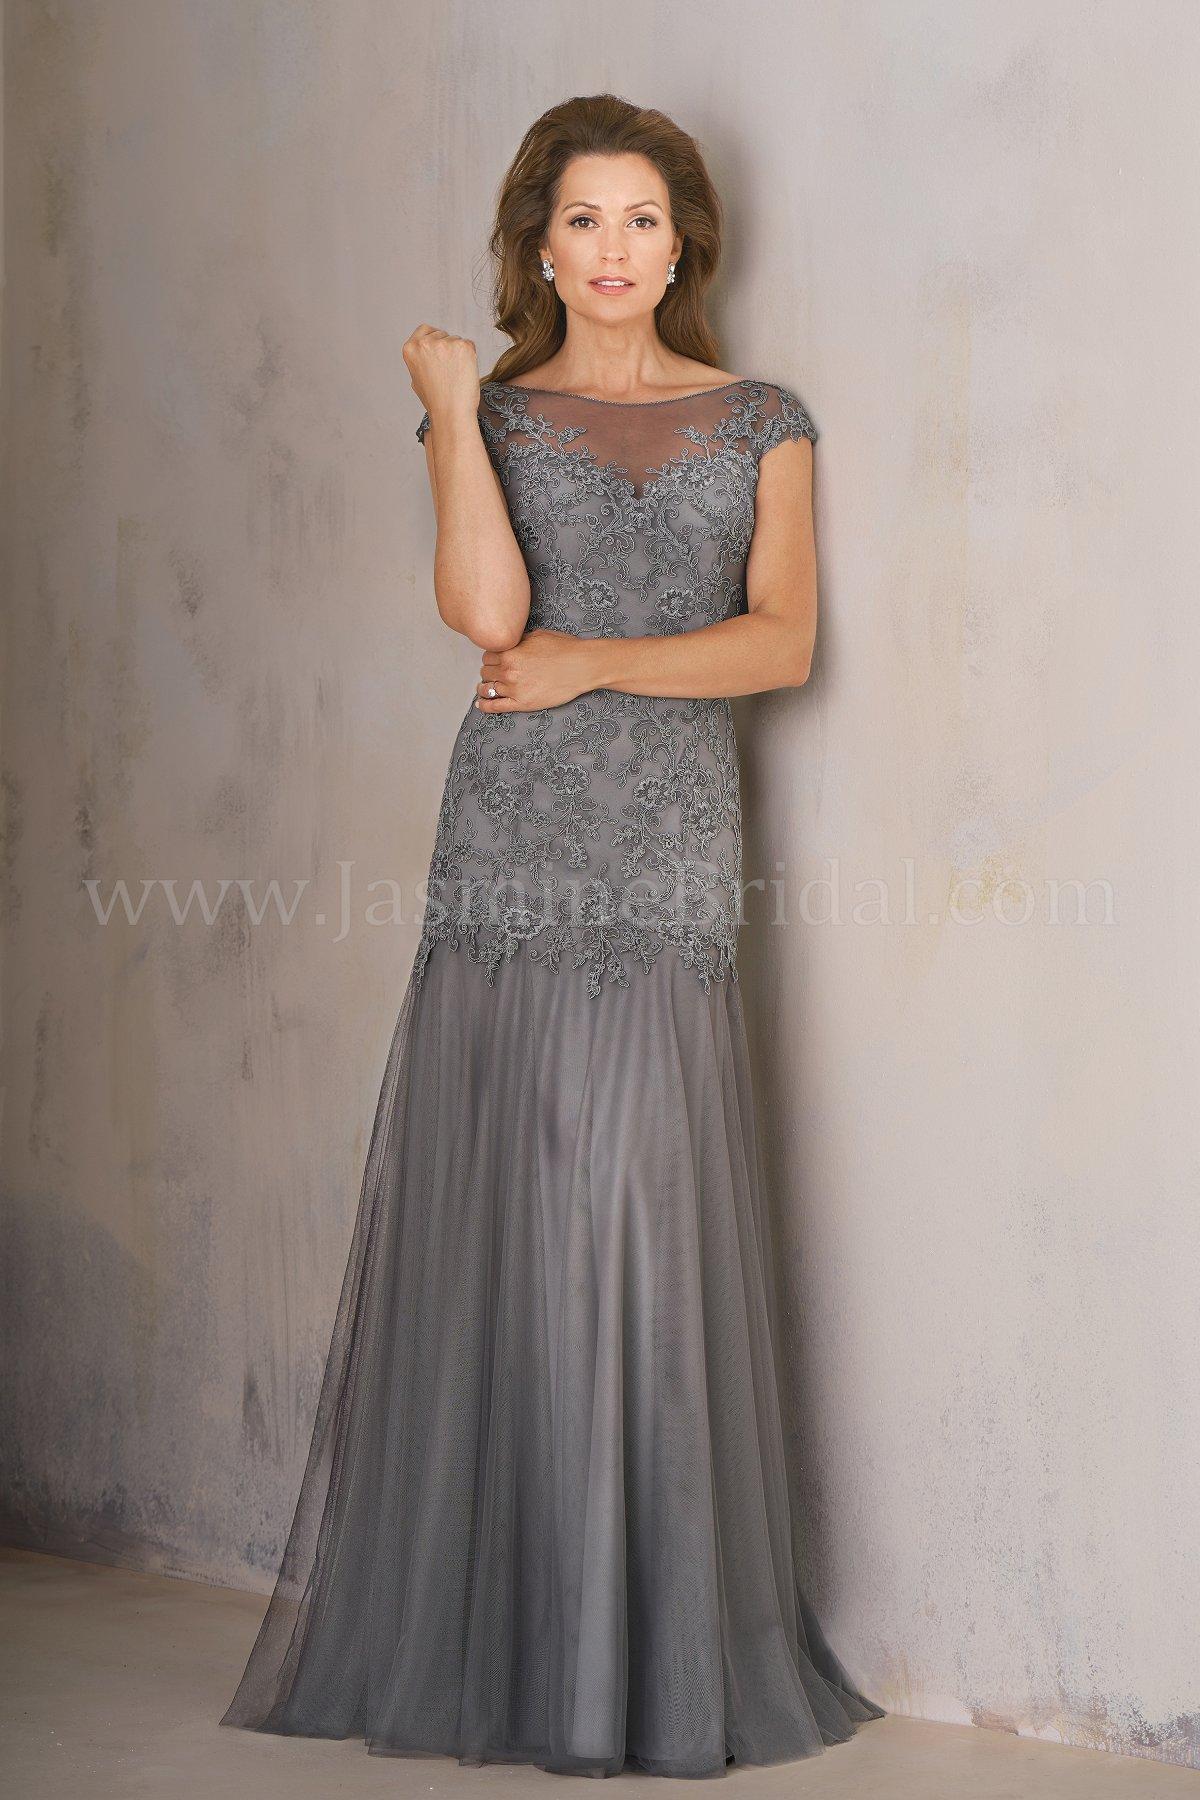 K208006 Long Illusion Neckline Lace Amp Netting Mob Dress